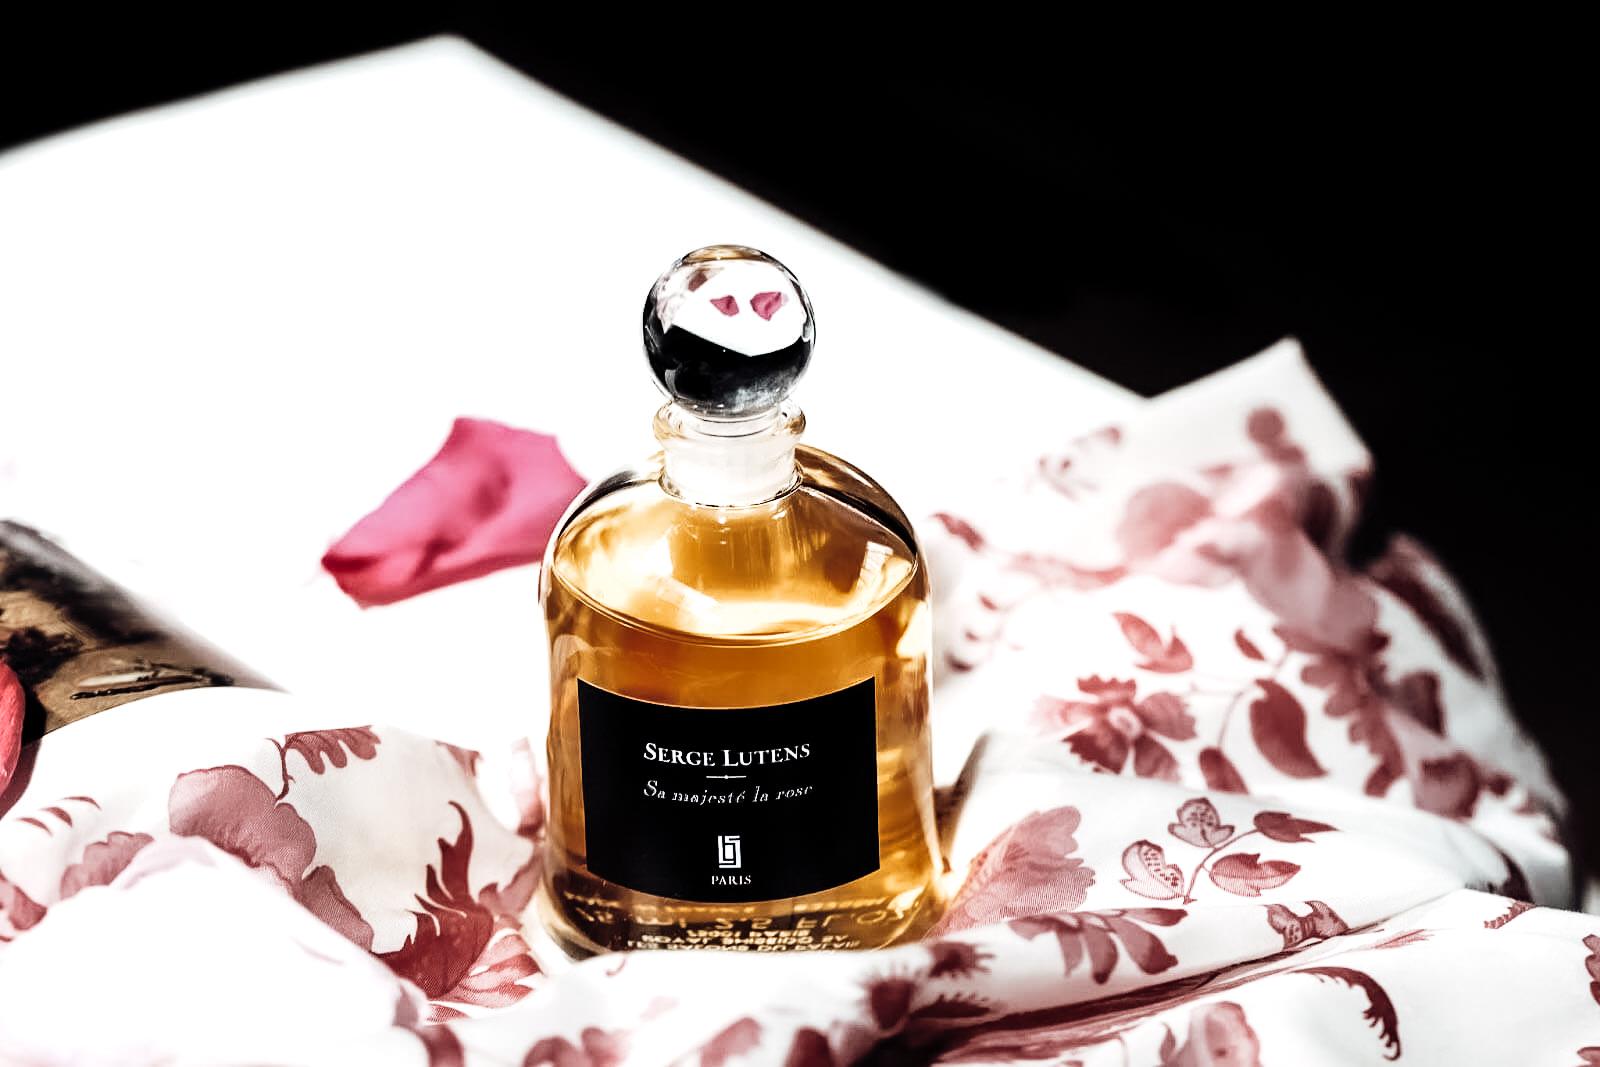 Sa Majeste La Rose Serge Lutens  parfum